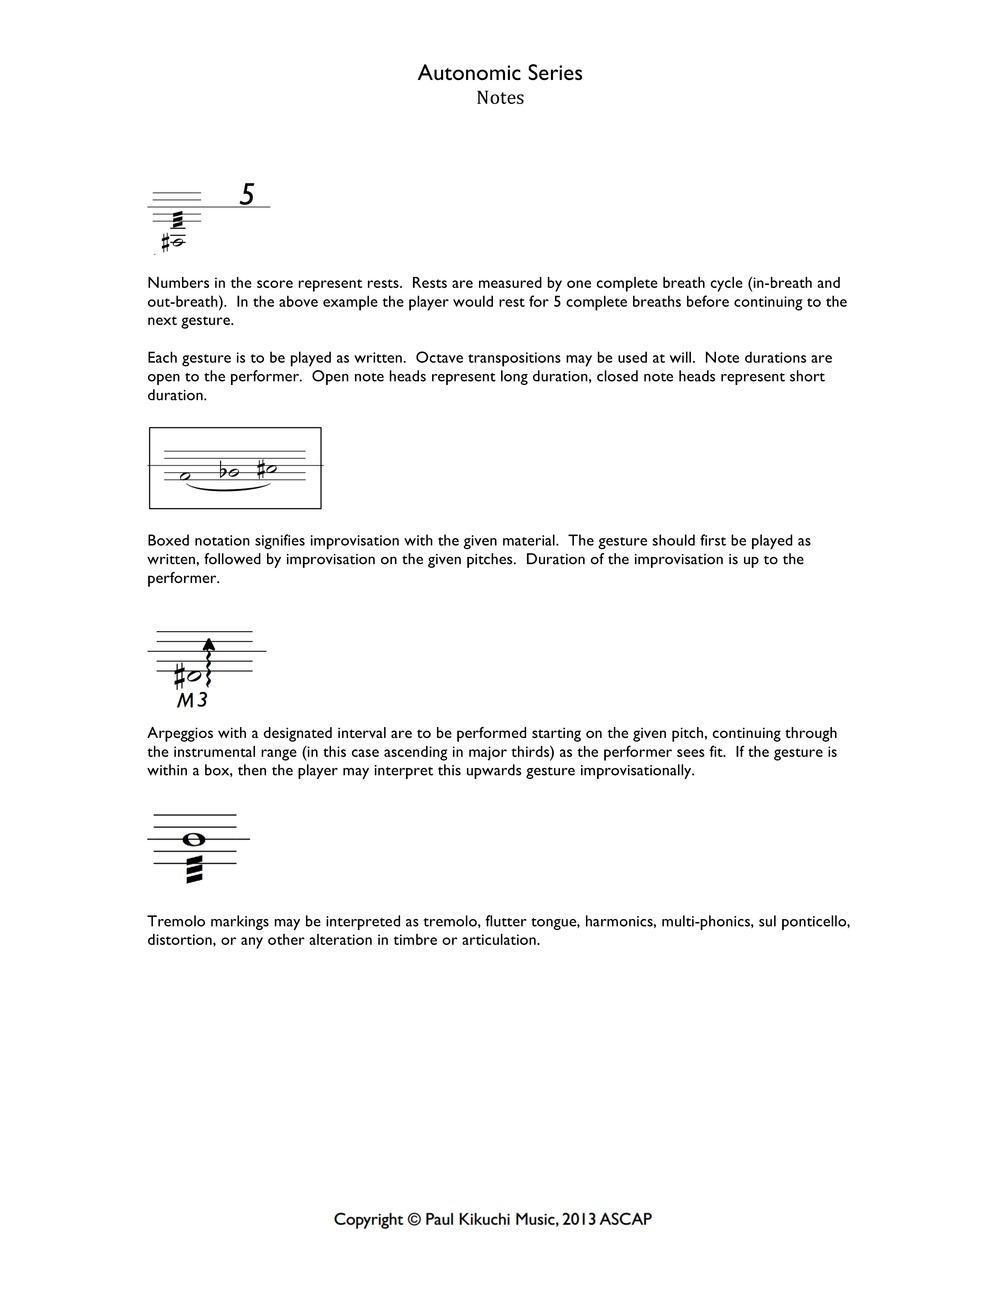 Autonomic_notes.jpg